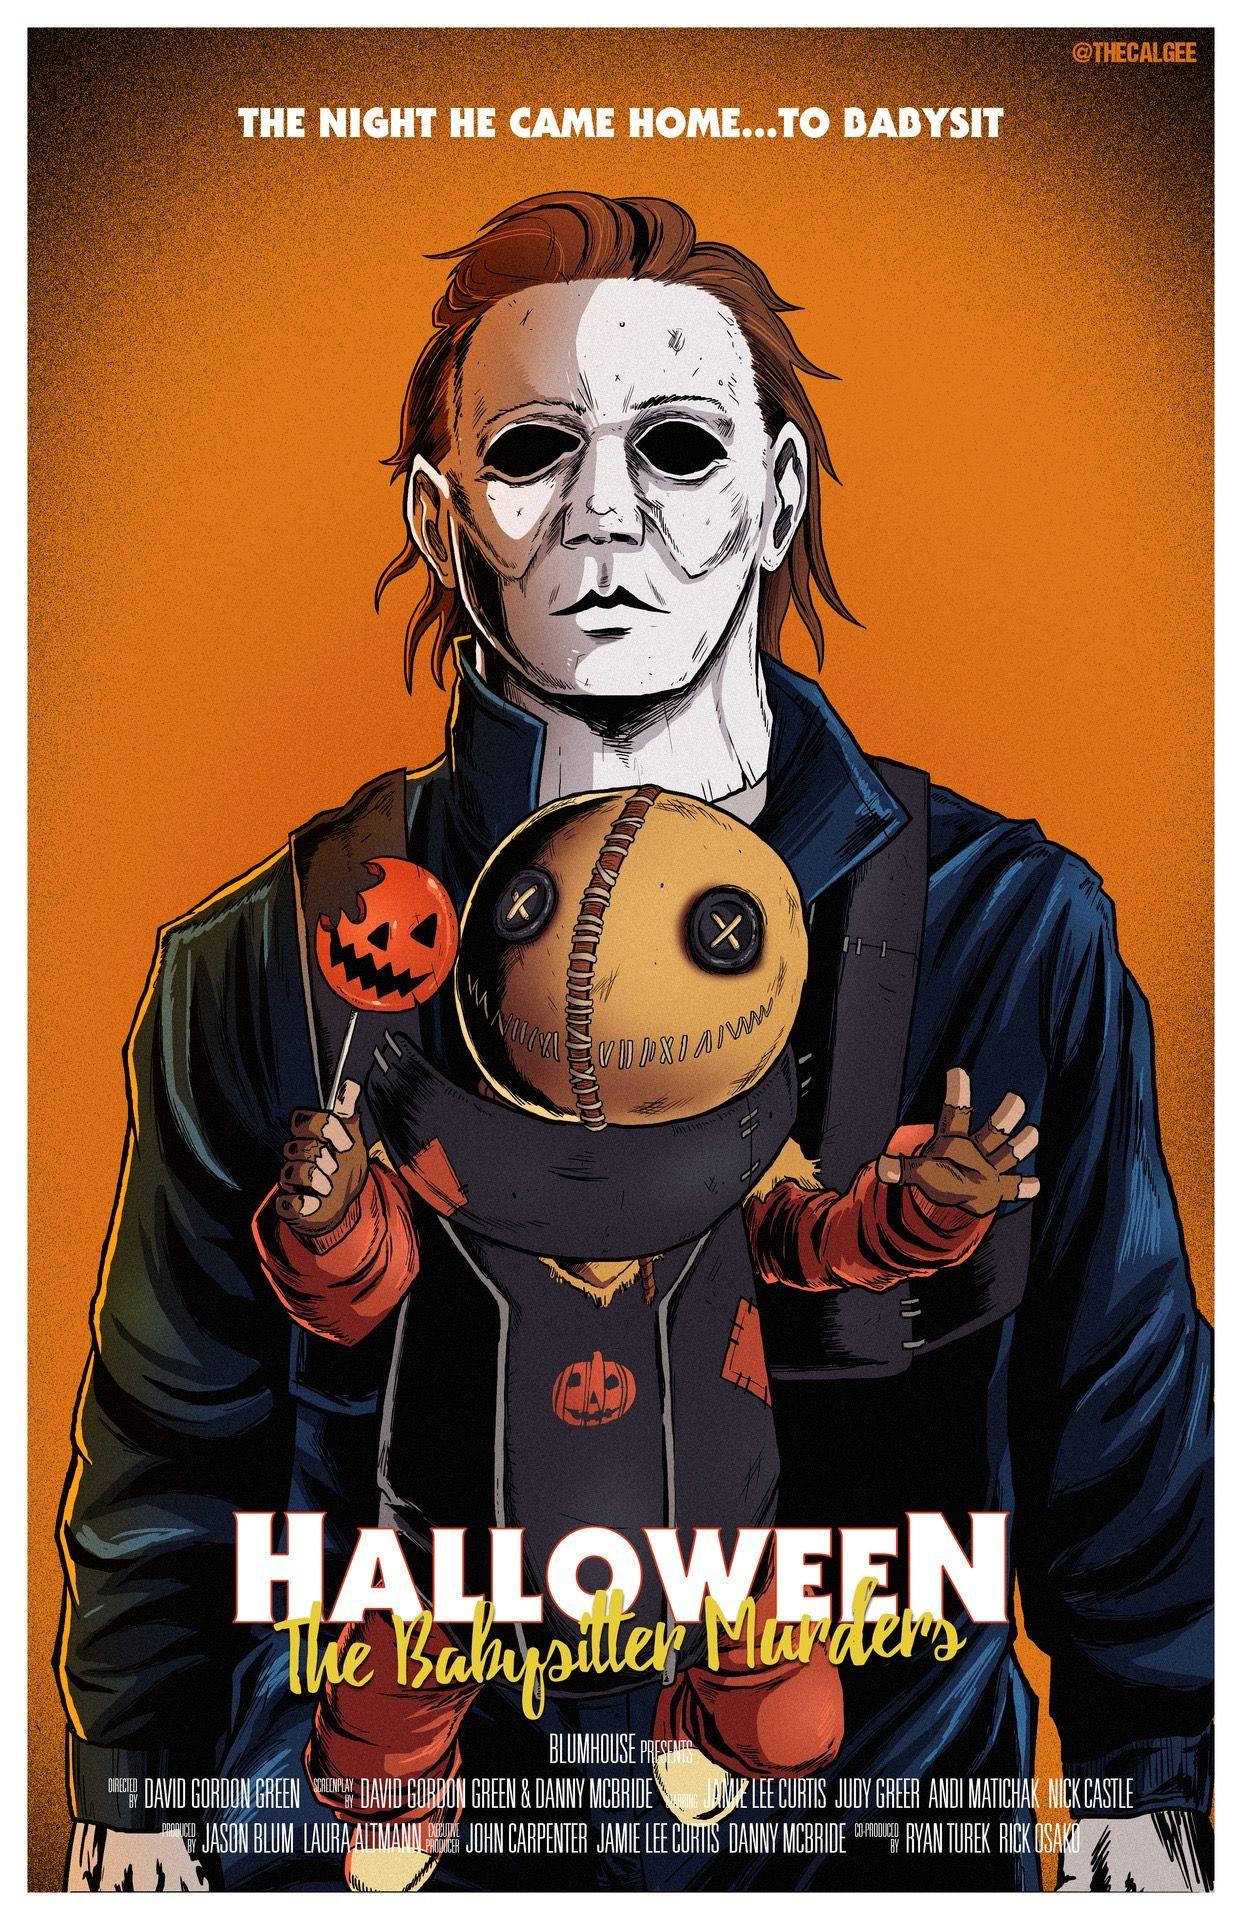 Imagen sobre Pantallas de halloween de ♡ʚ♧ƸӜƷ♧•3u7732f£4